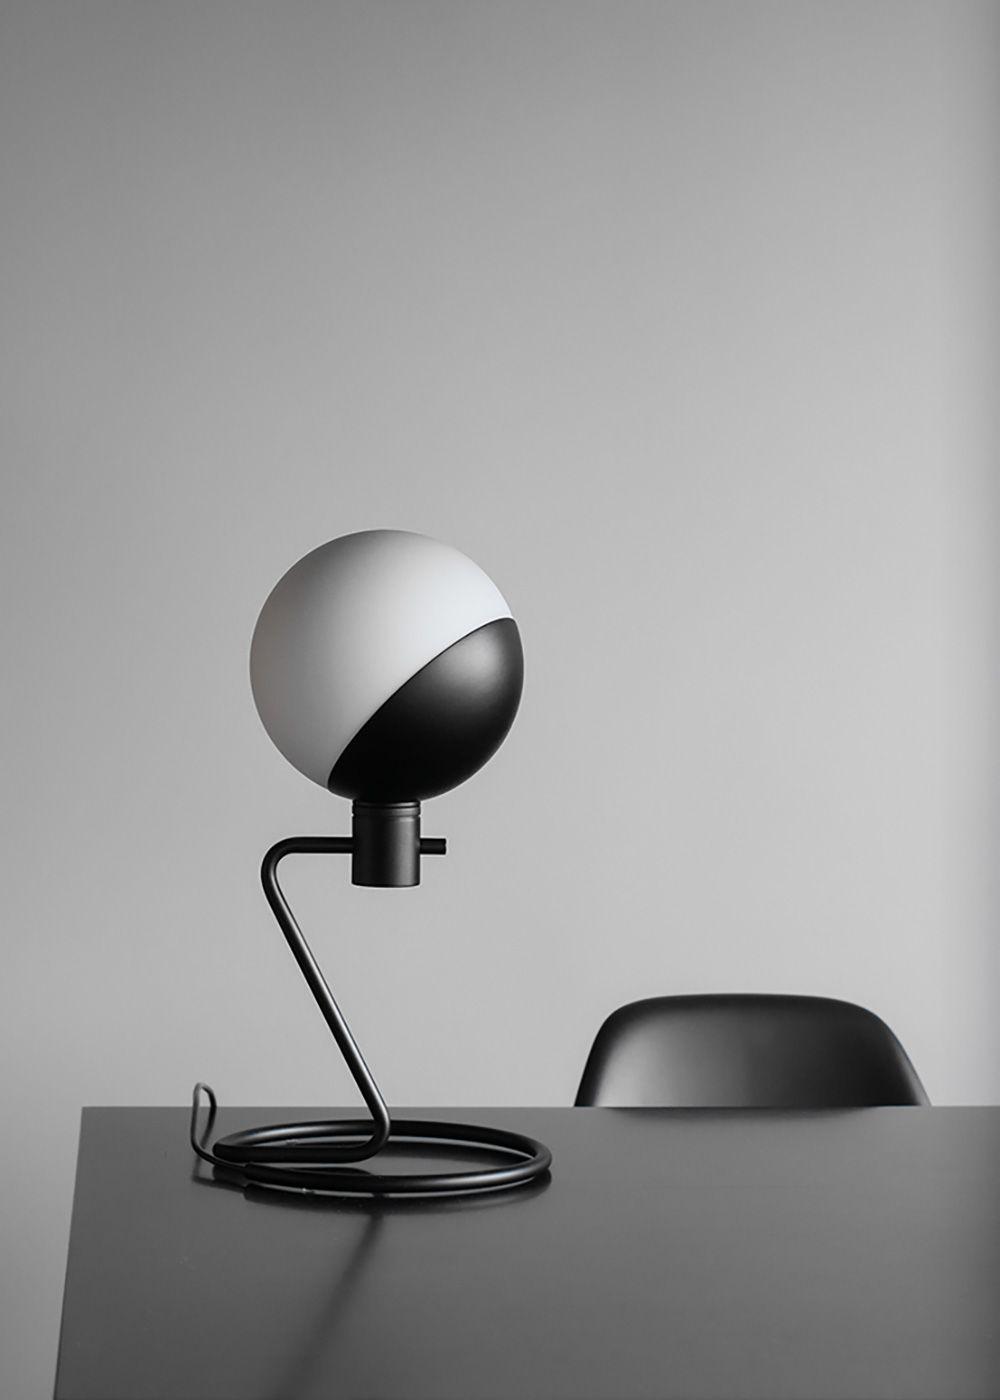 designing lighting. Baluna Lamp / Designing Baluna, We Aimed To Design Light Itself; The Way It Lighting